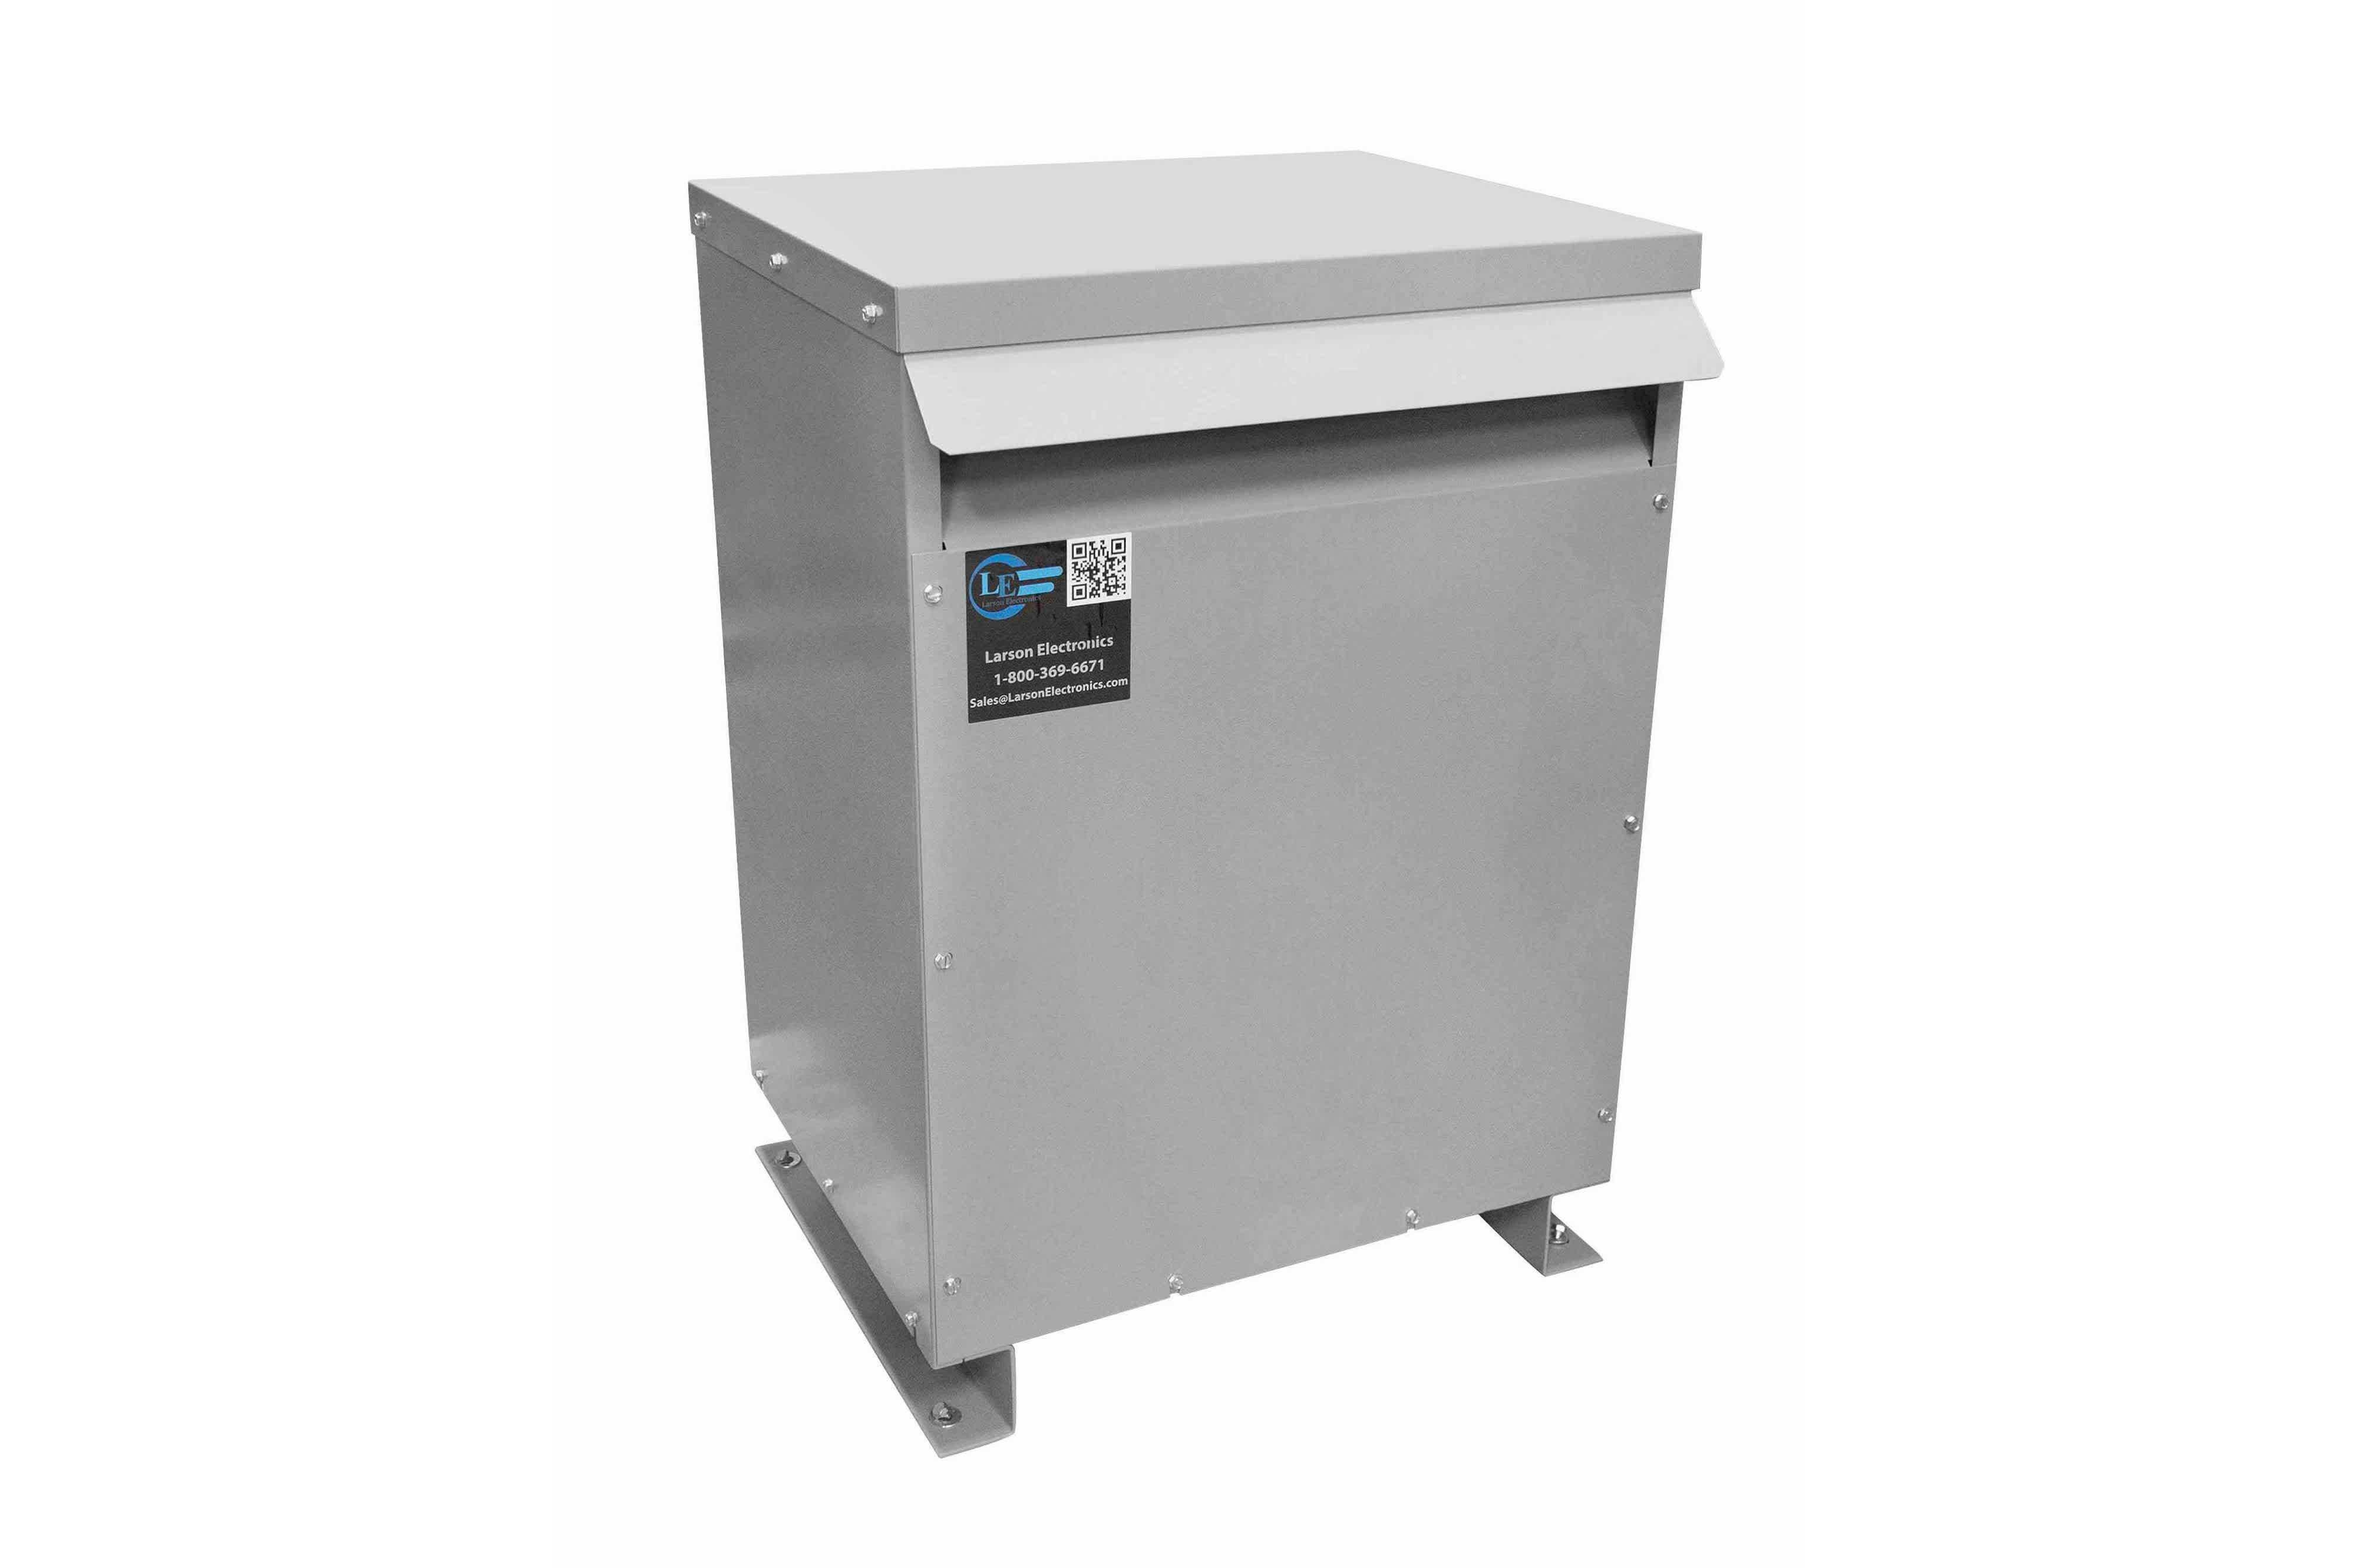 500 kVA 3PH Isolation Transformer, 480V Wye Primary, 380Y/220 Wye-N Secondary, N3R, Ventilated, 60 Hz